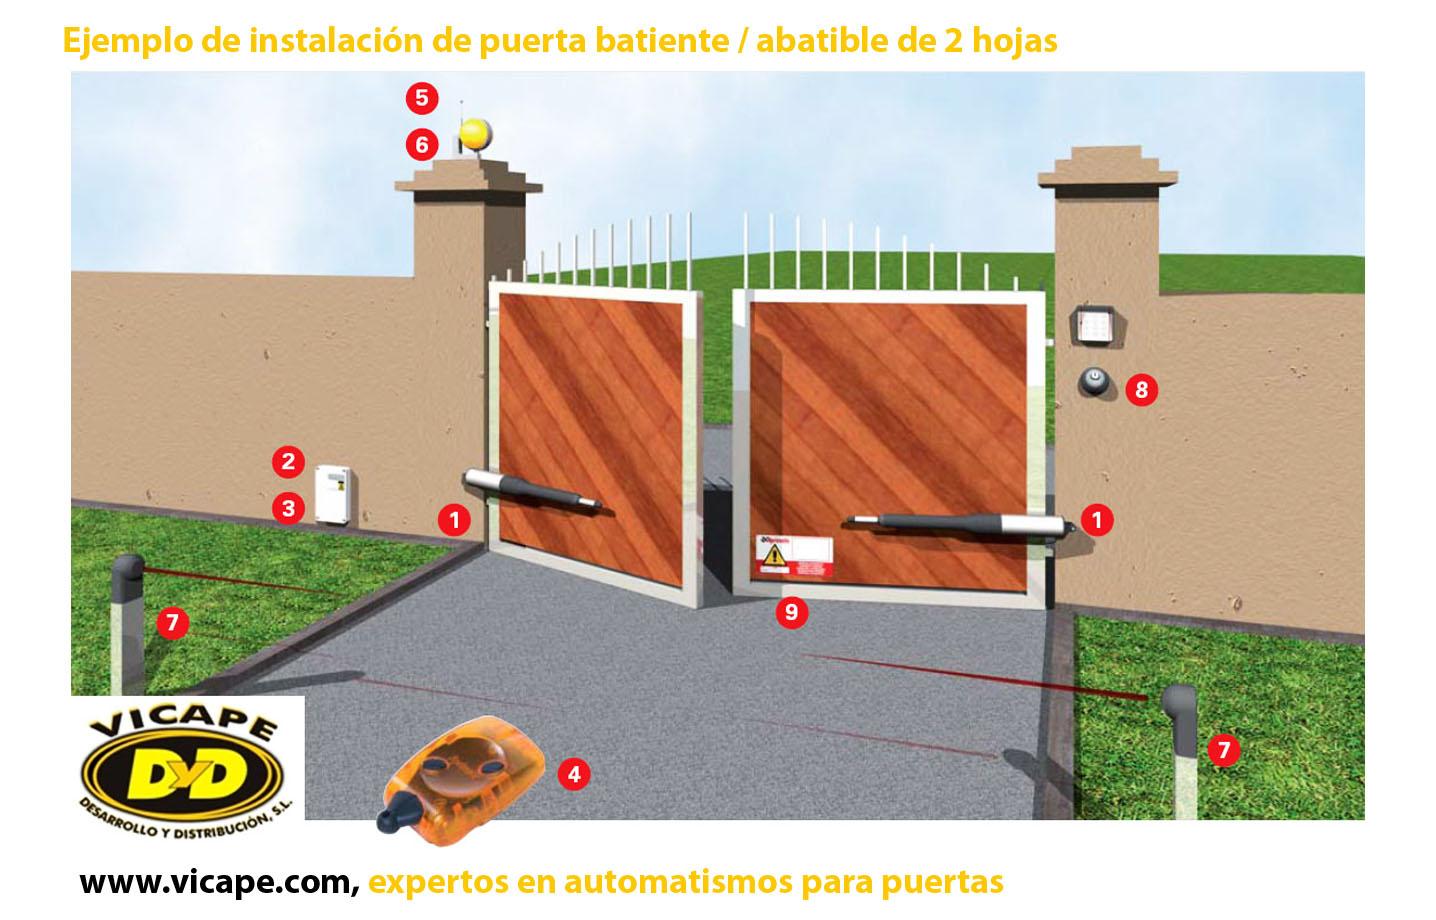 Puertas abatibles autom ticas vicape com expertos en - Mecanismo puerta garaje ...